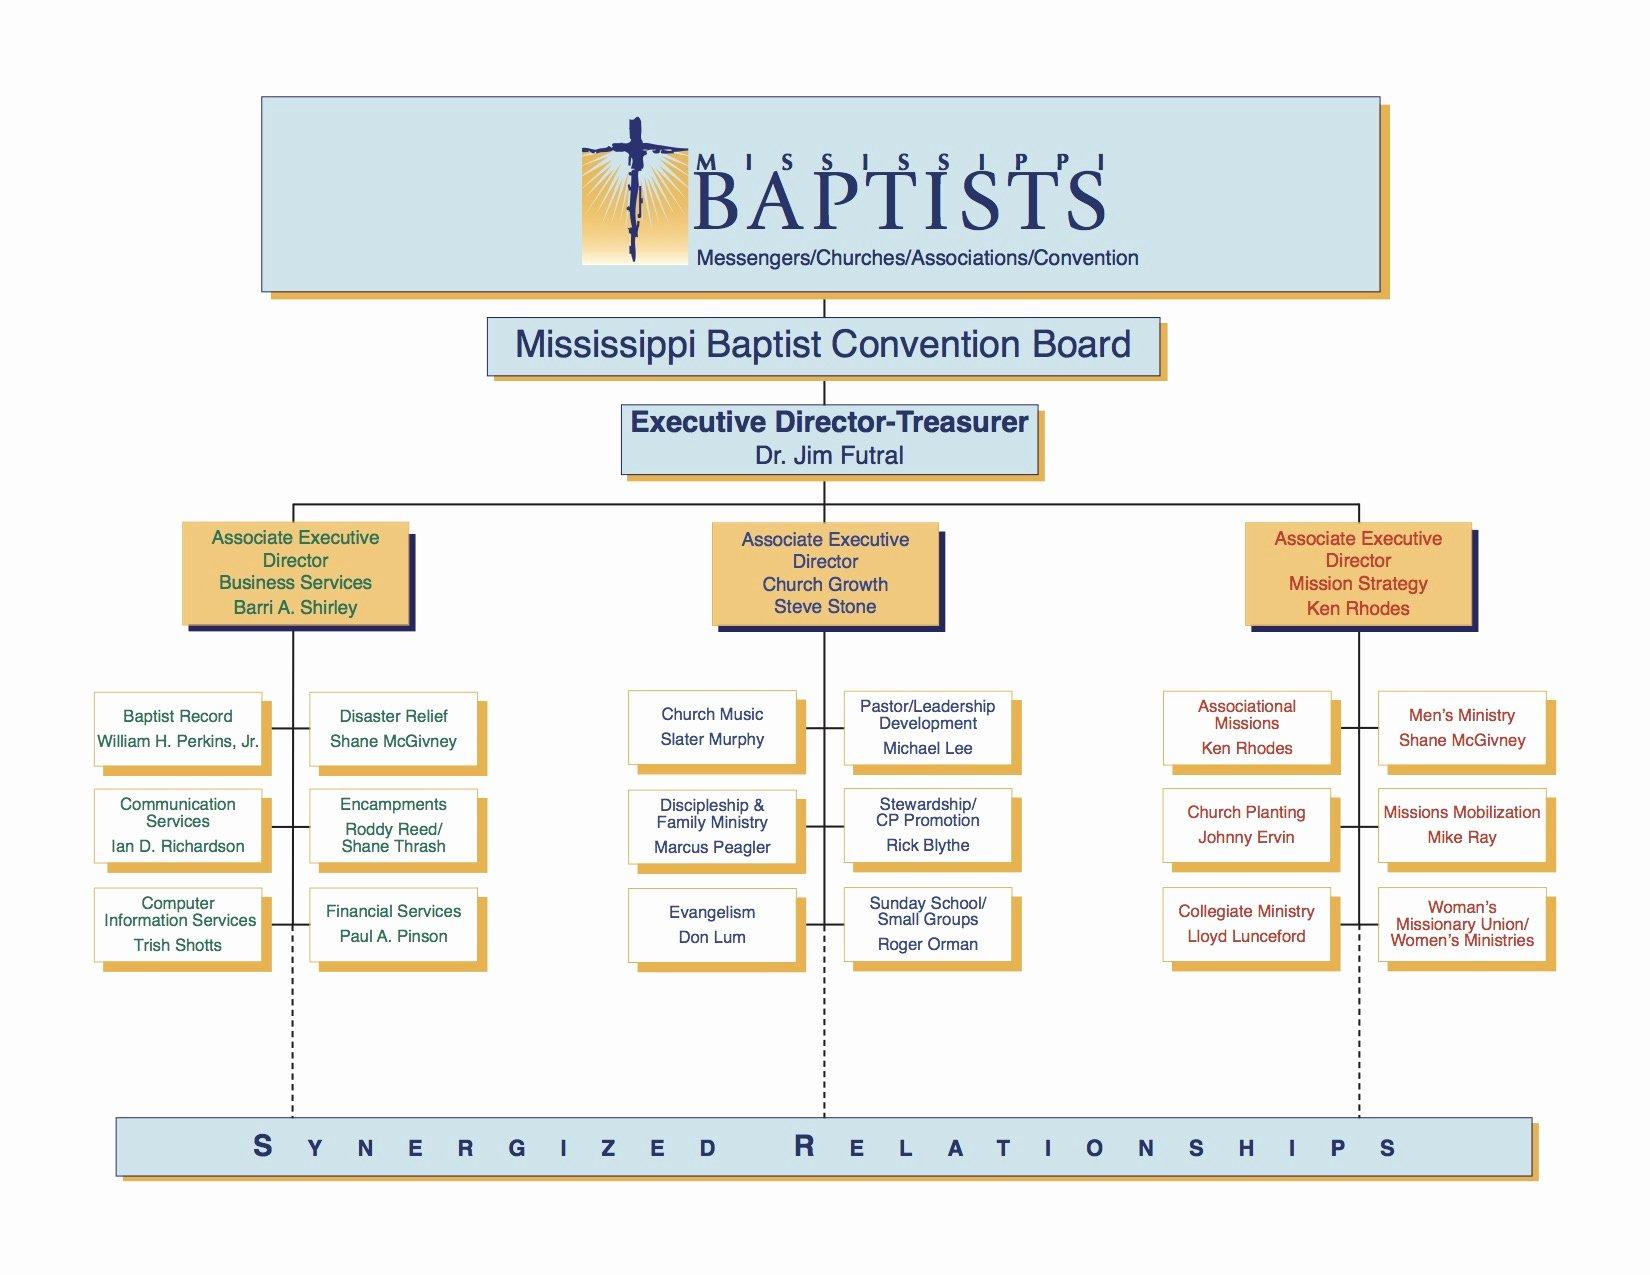 Church organizational Chart Template Unique organizational Chart Mississippi Baptist Convention Board